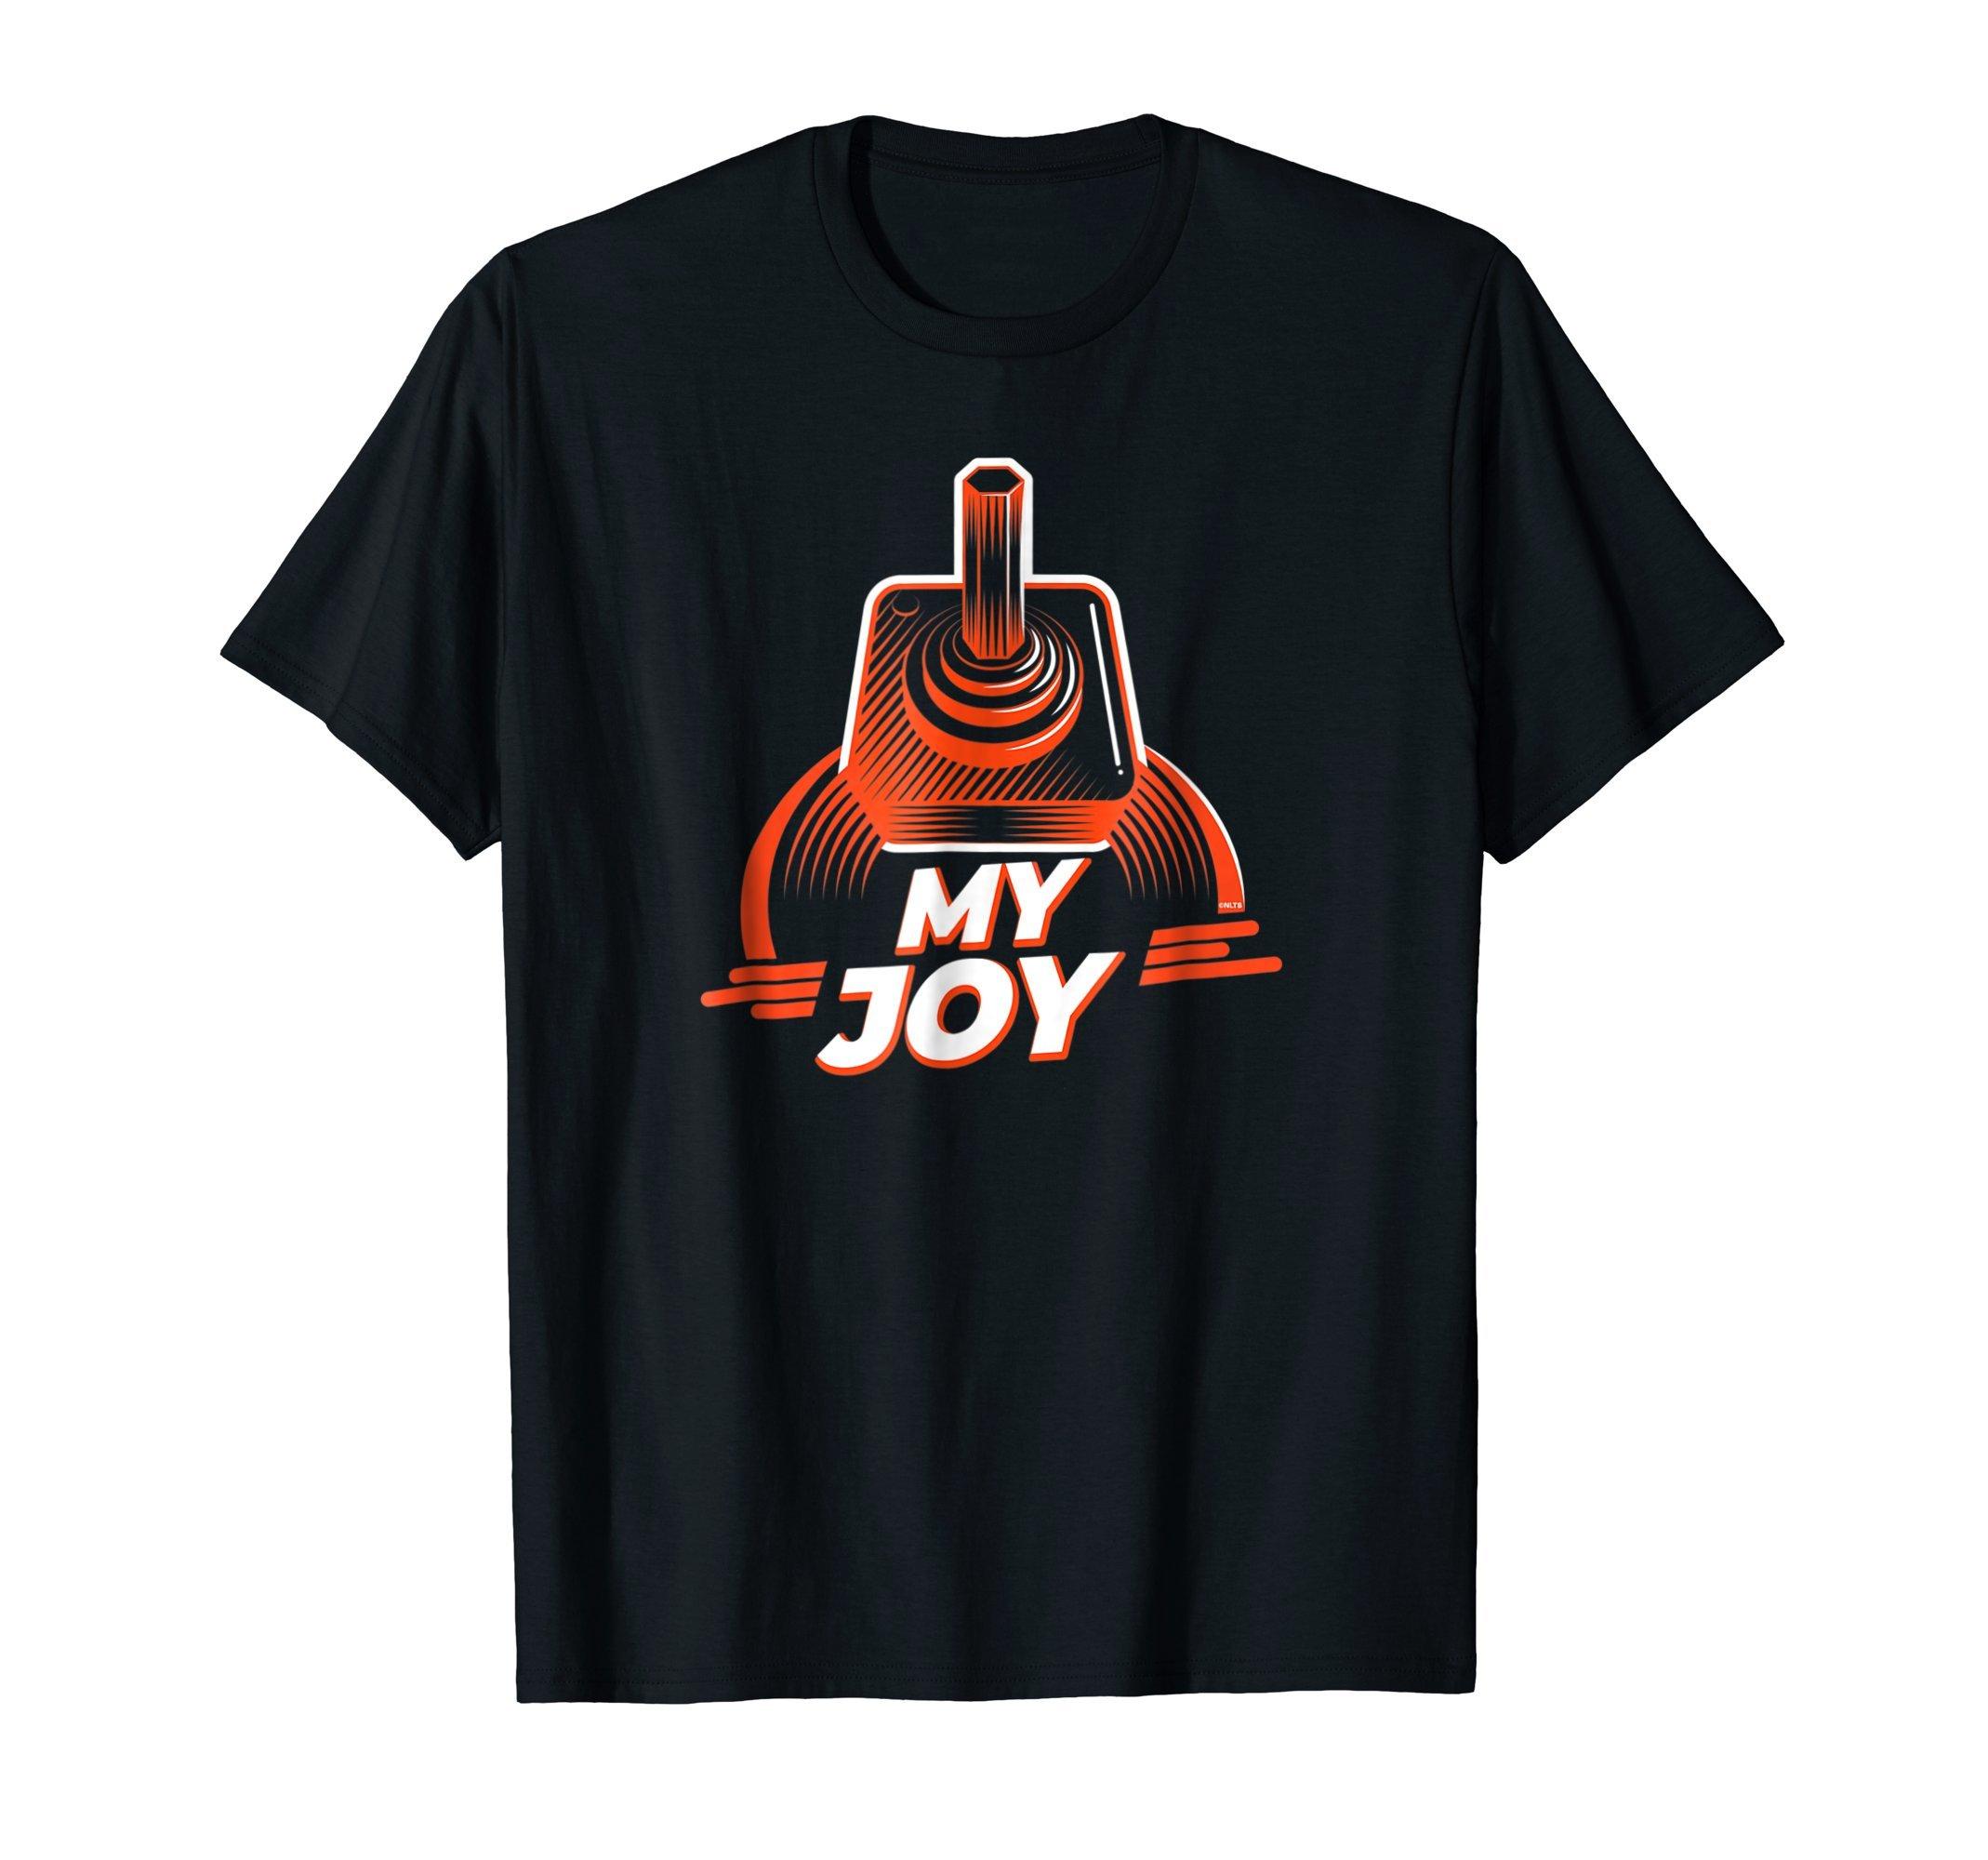 My-Joy-Gamer-Joystick-Funny-Humor-T-Shirt-Tee-Shirt-Gift